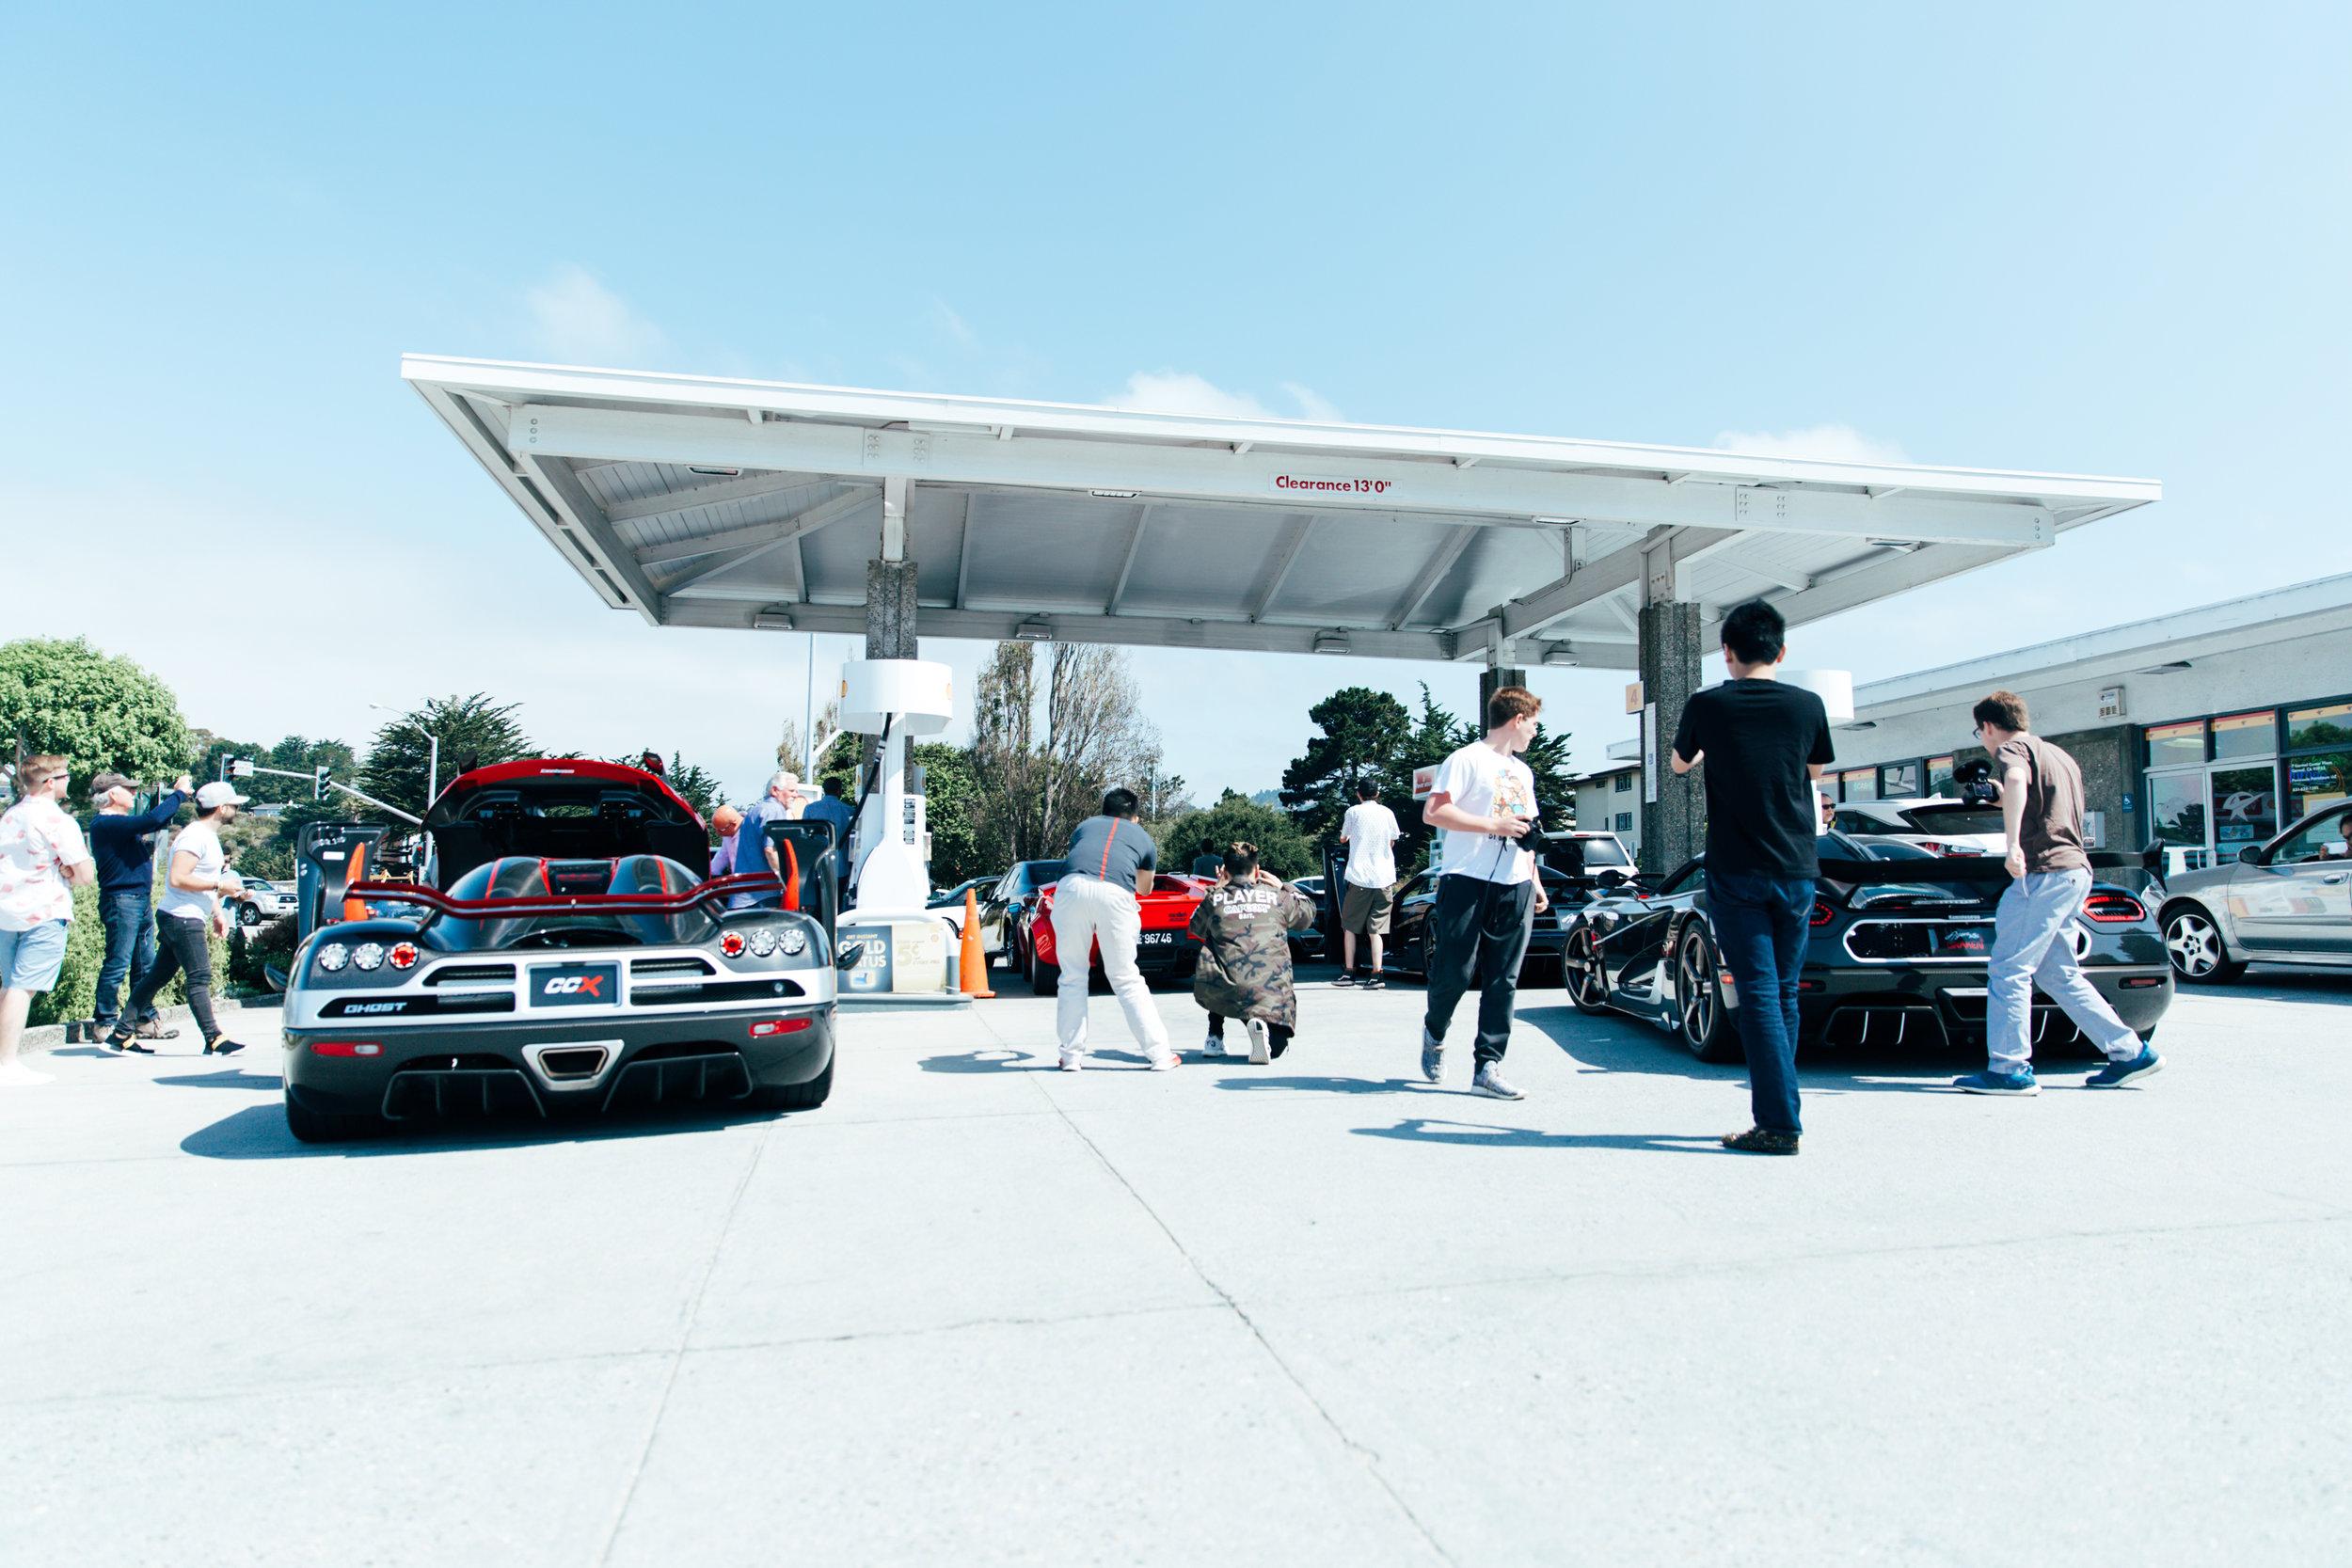 Stay_Driven_Monterey_Car_Week_Koenigsegg-60.jpg